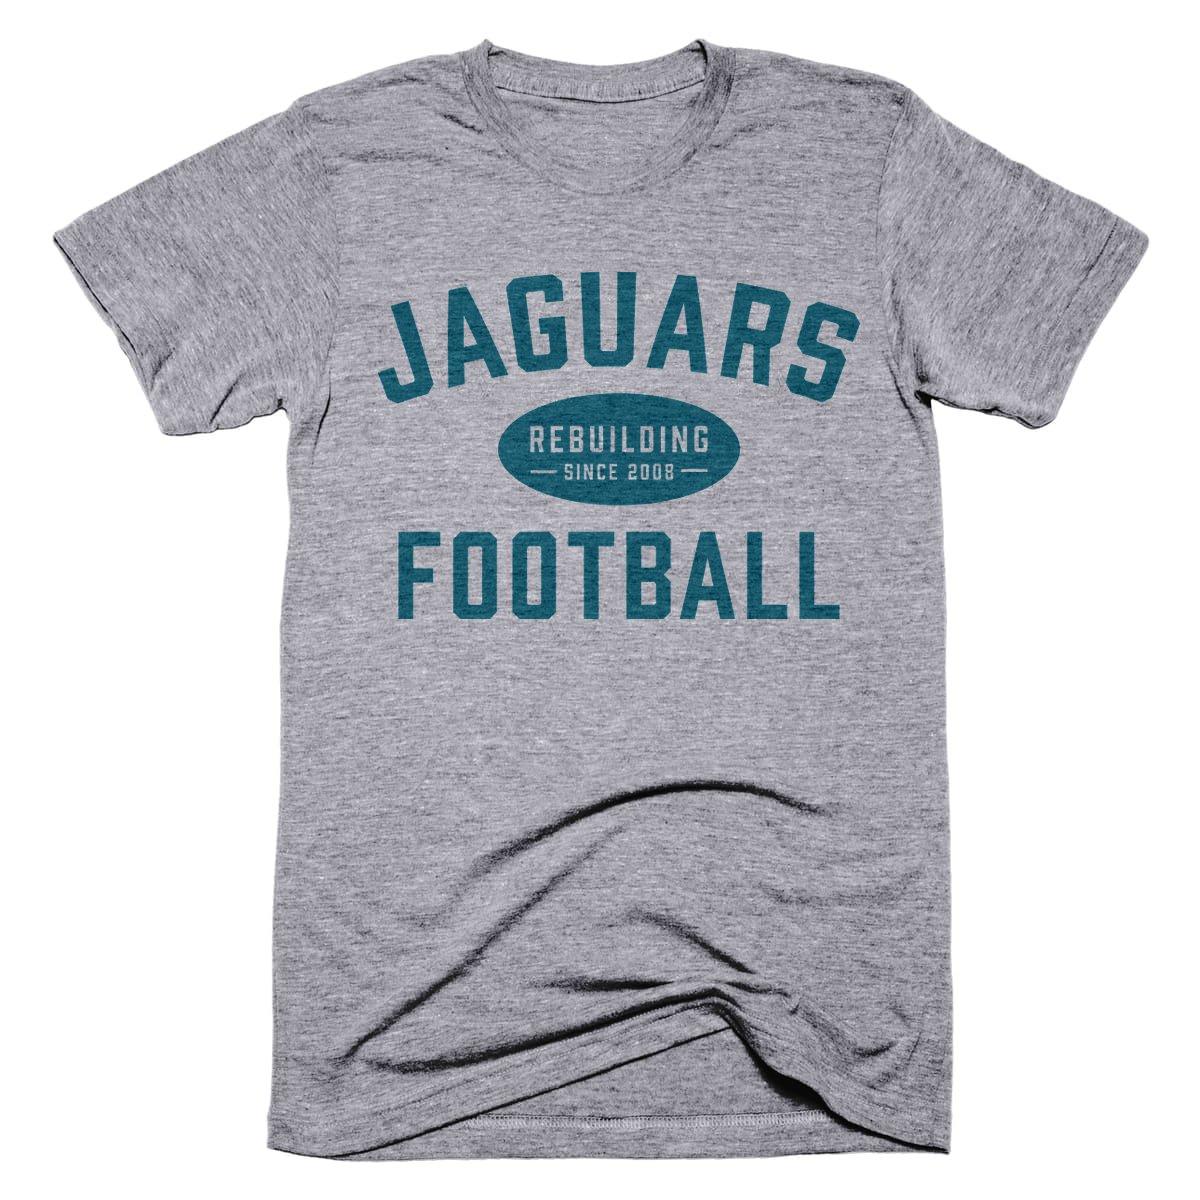 No comment. #Jaguars #nflhu #sendmethisasabirthdaygift<br>http://pic.twitter.com/YC0w9FBMGg